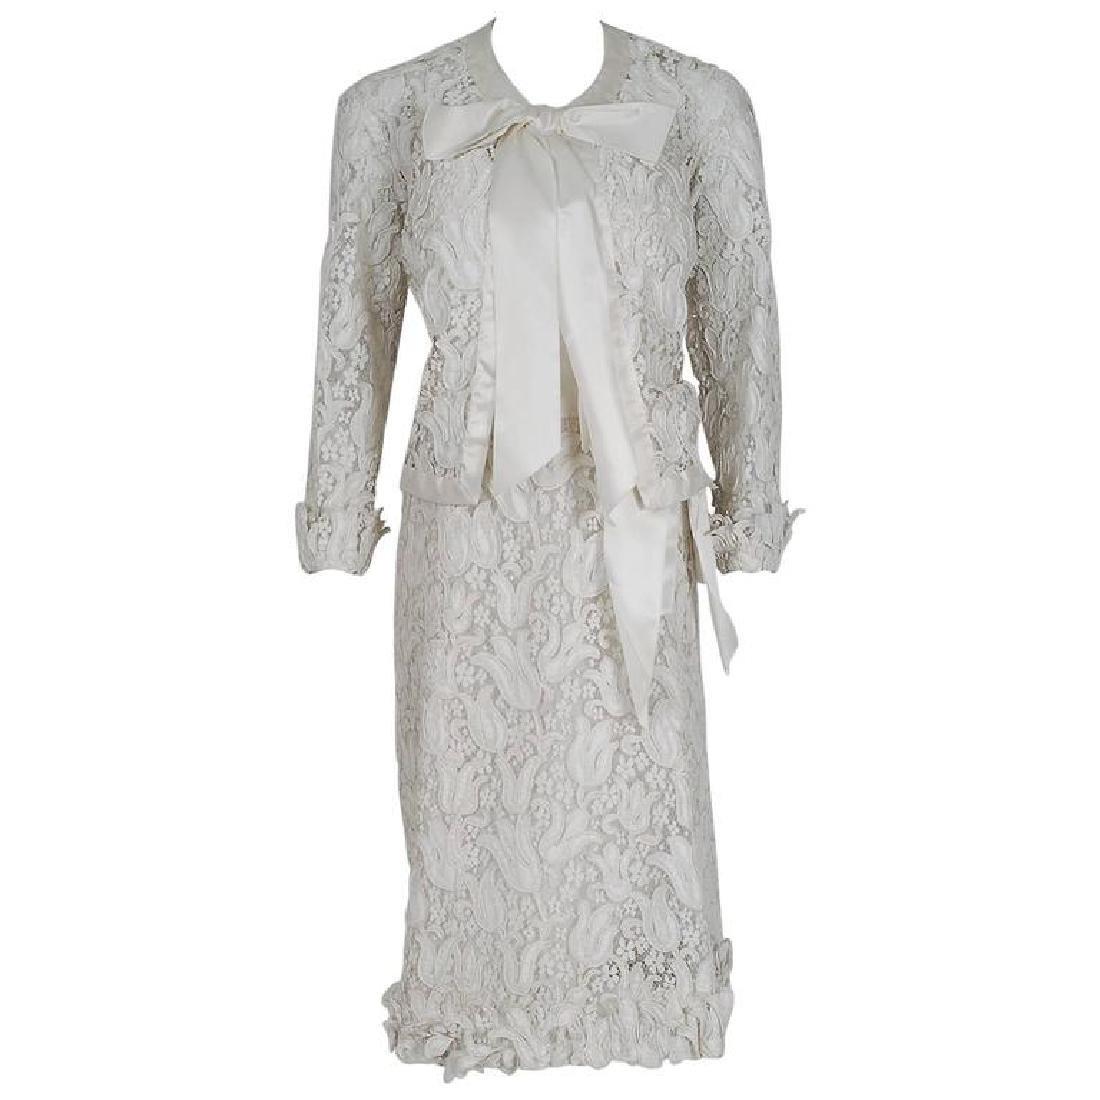 1966 Chanel Haute Couture White Tulip Novelty Lace &